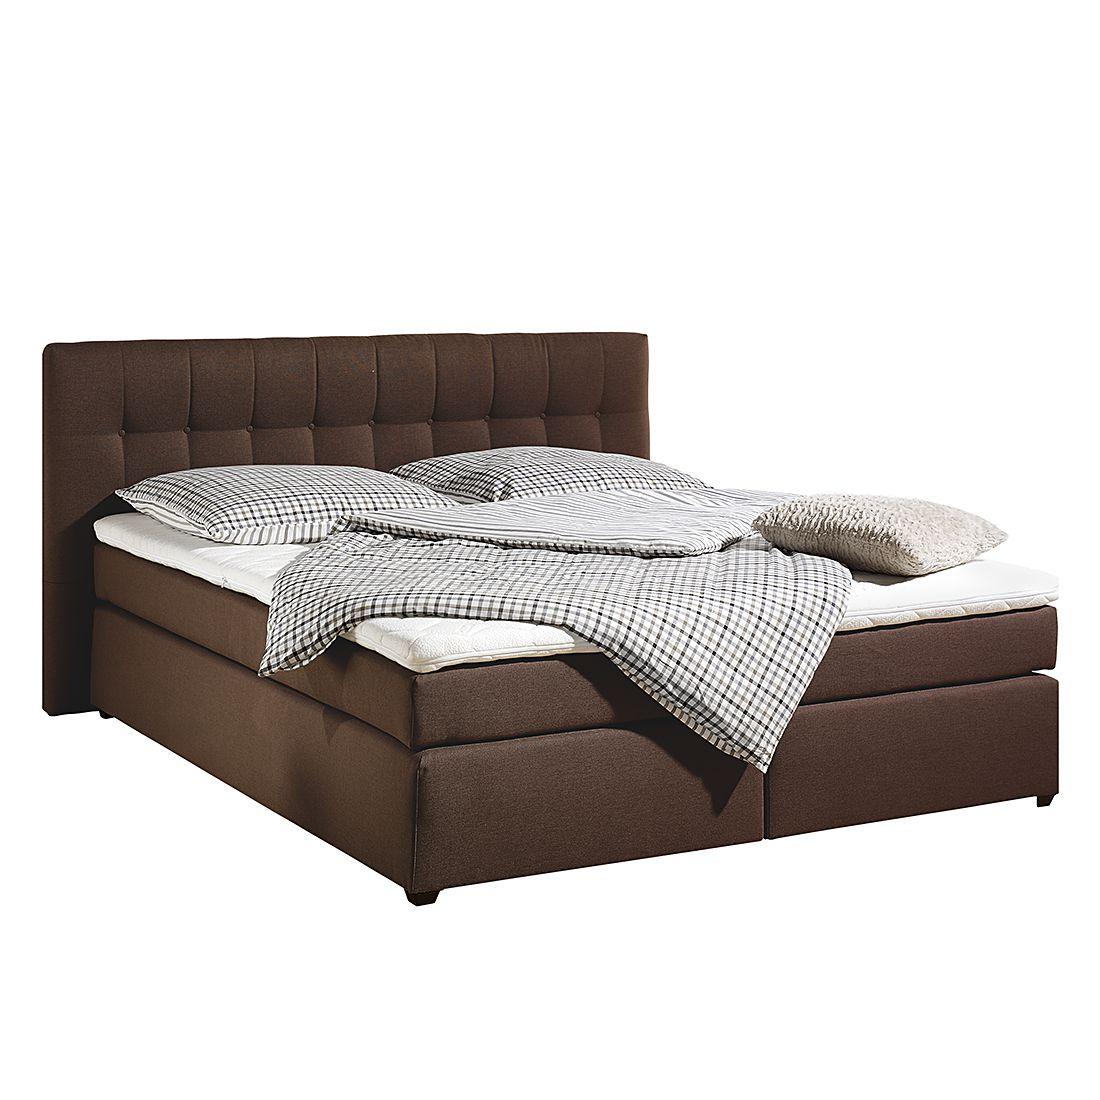 boxspringbett jean inklusive topper strukturstoff 100 x 200cm h2 bis 80 kg. Black Bedroom Furniture Sets. Home Design Ideas